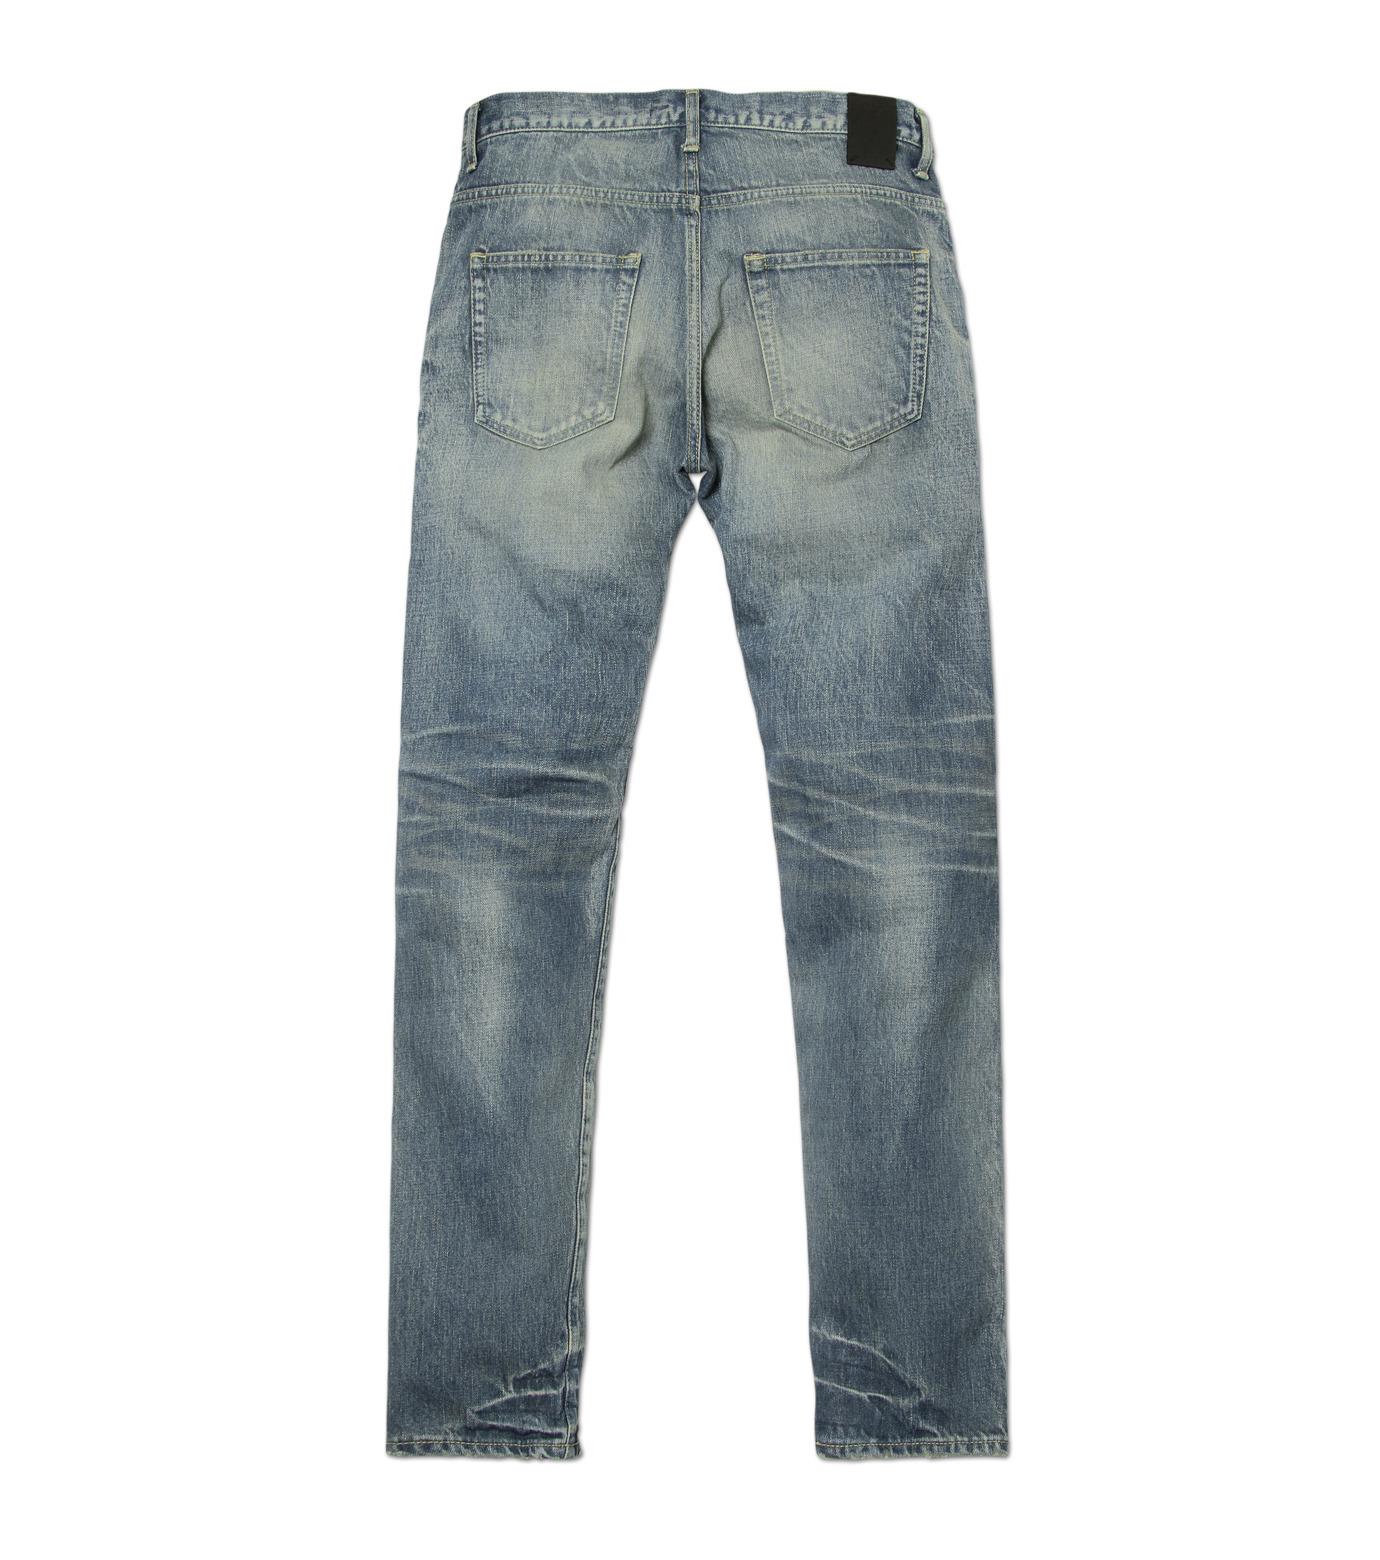 HL HEDDIE LOVU(エイチエル・エディールーヴ)のDamage Denim PT-BLUE(パンツ/pants)-17S98003-92 拡大詳細画像5